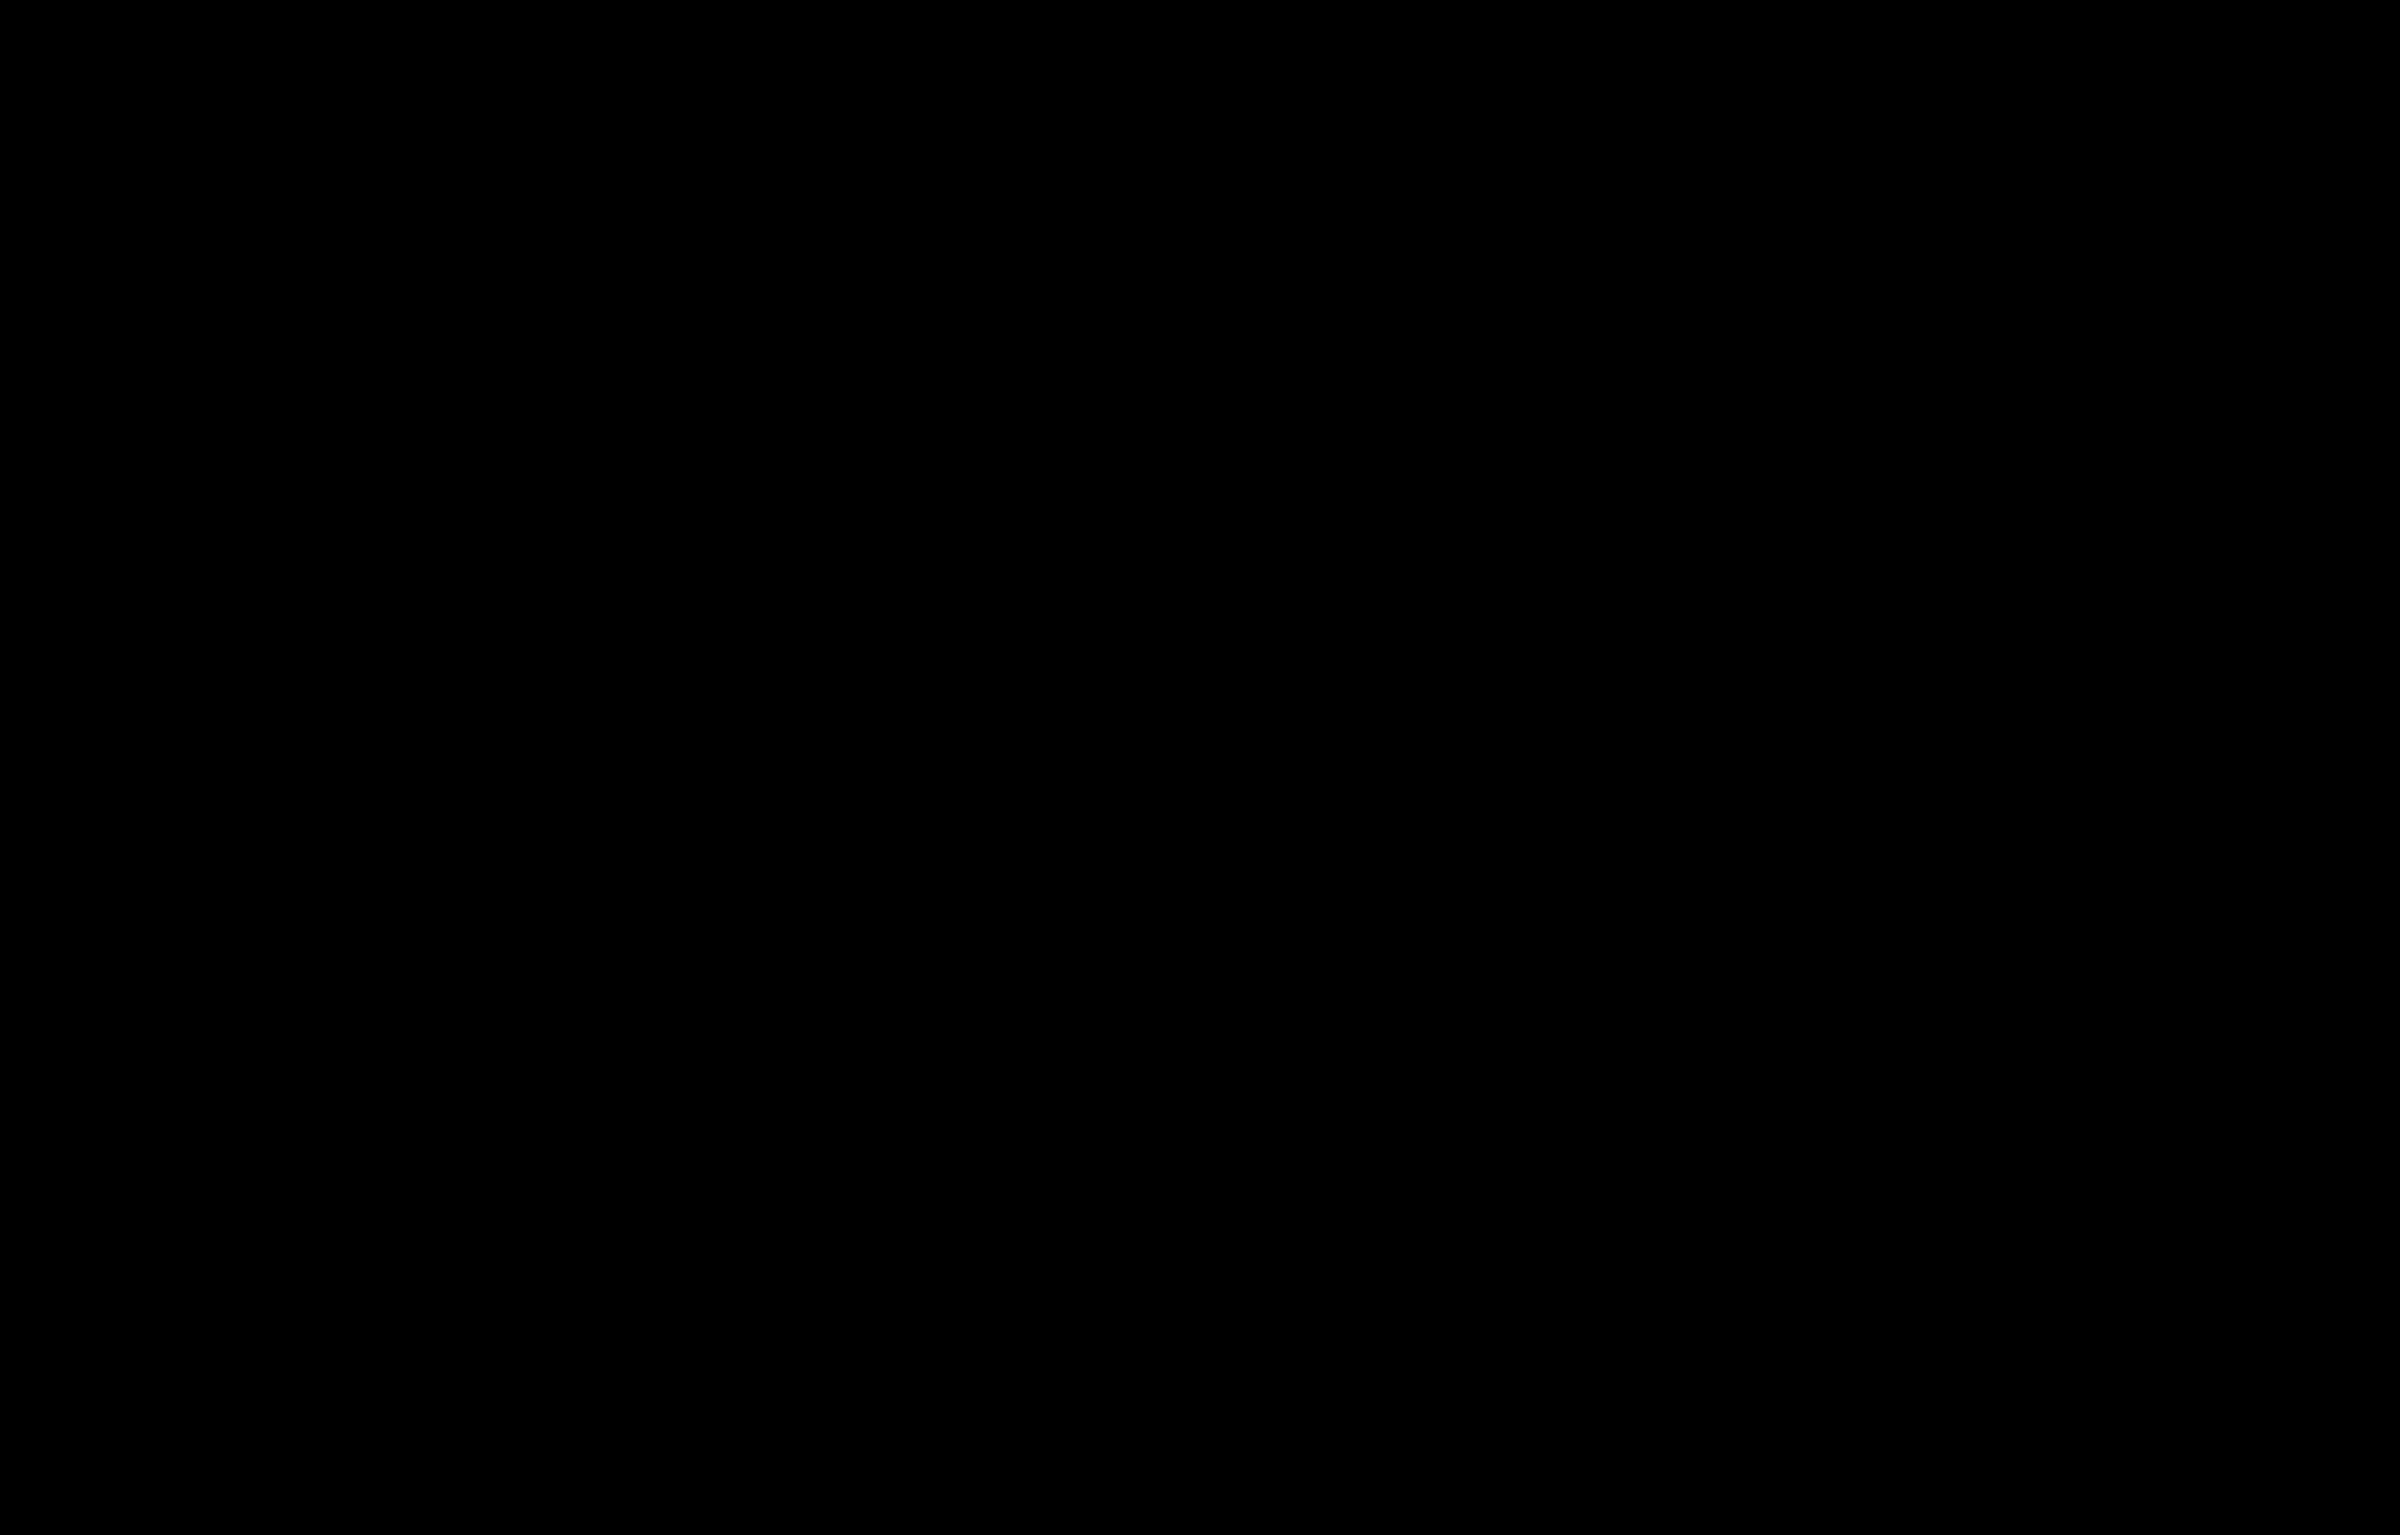 Honeycomb silhouette